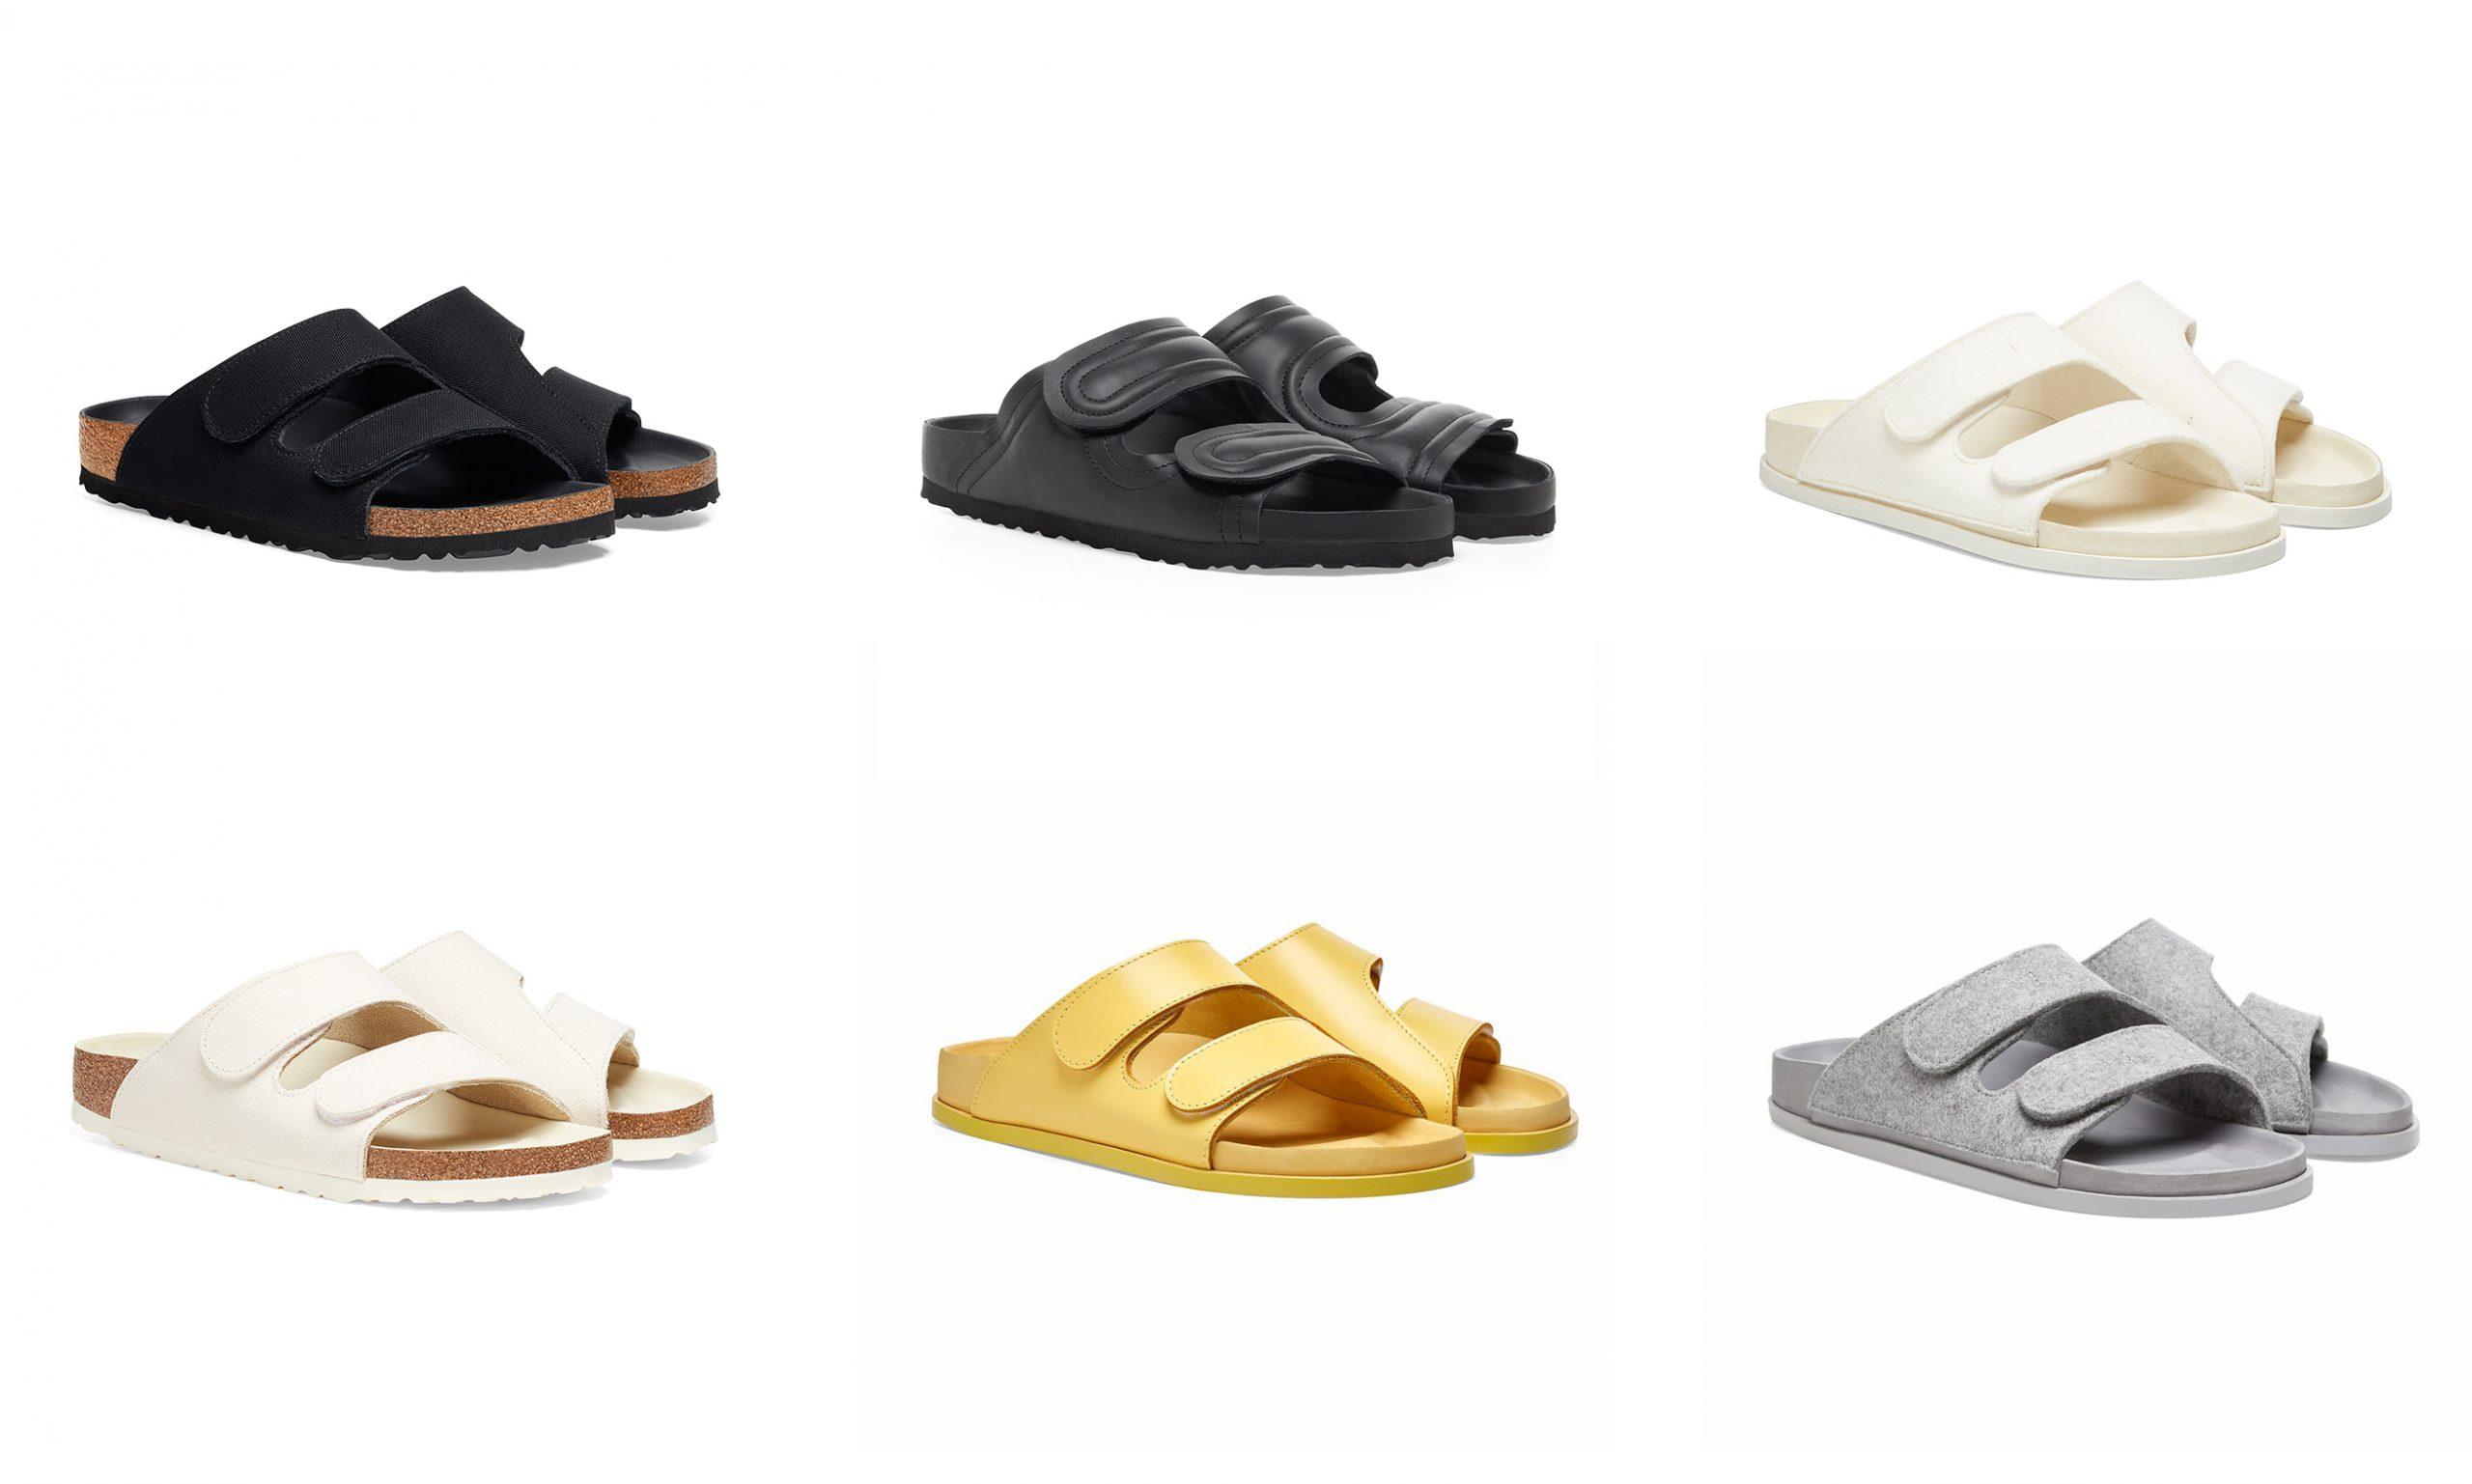 Toogood x Birkenstock 联名系列鞋款登场